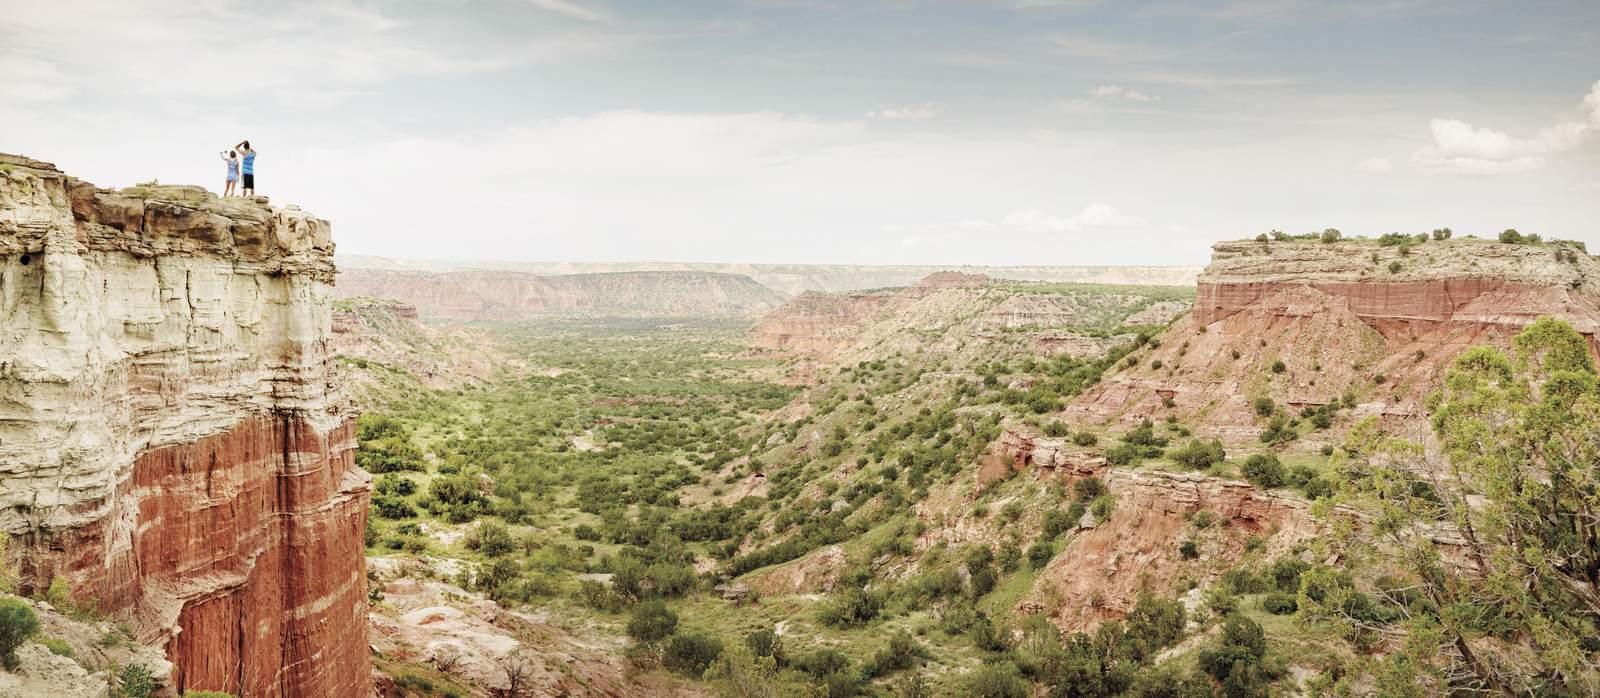 Palo Duro Canyon in Texas